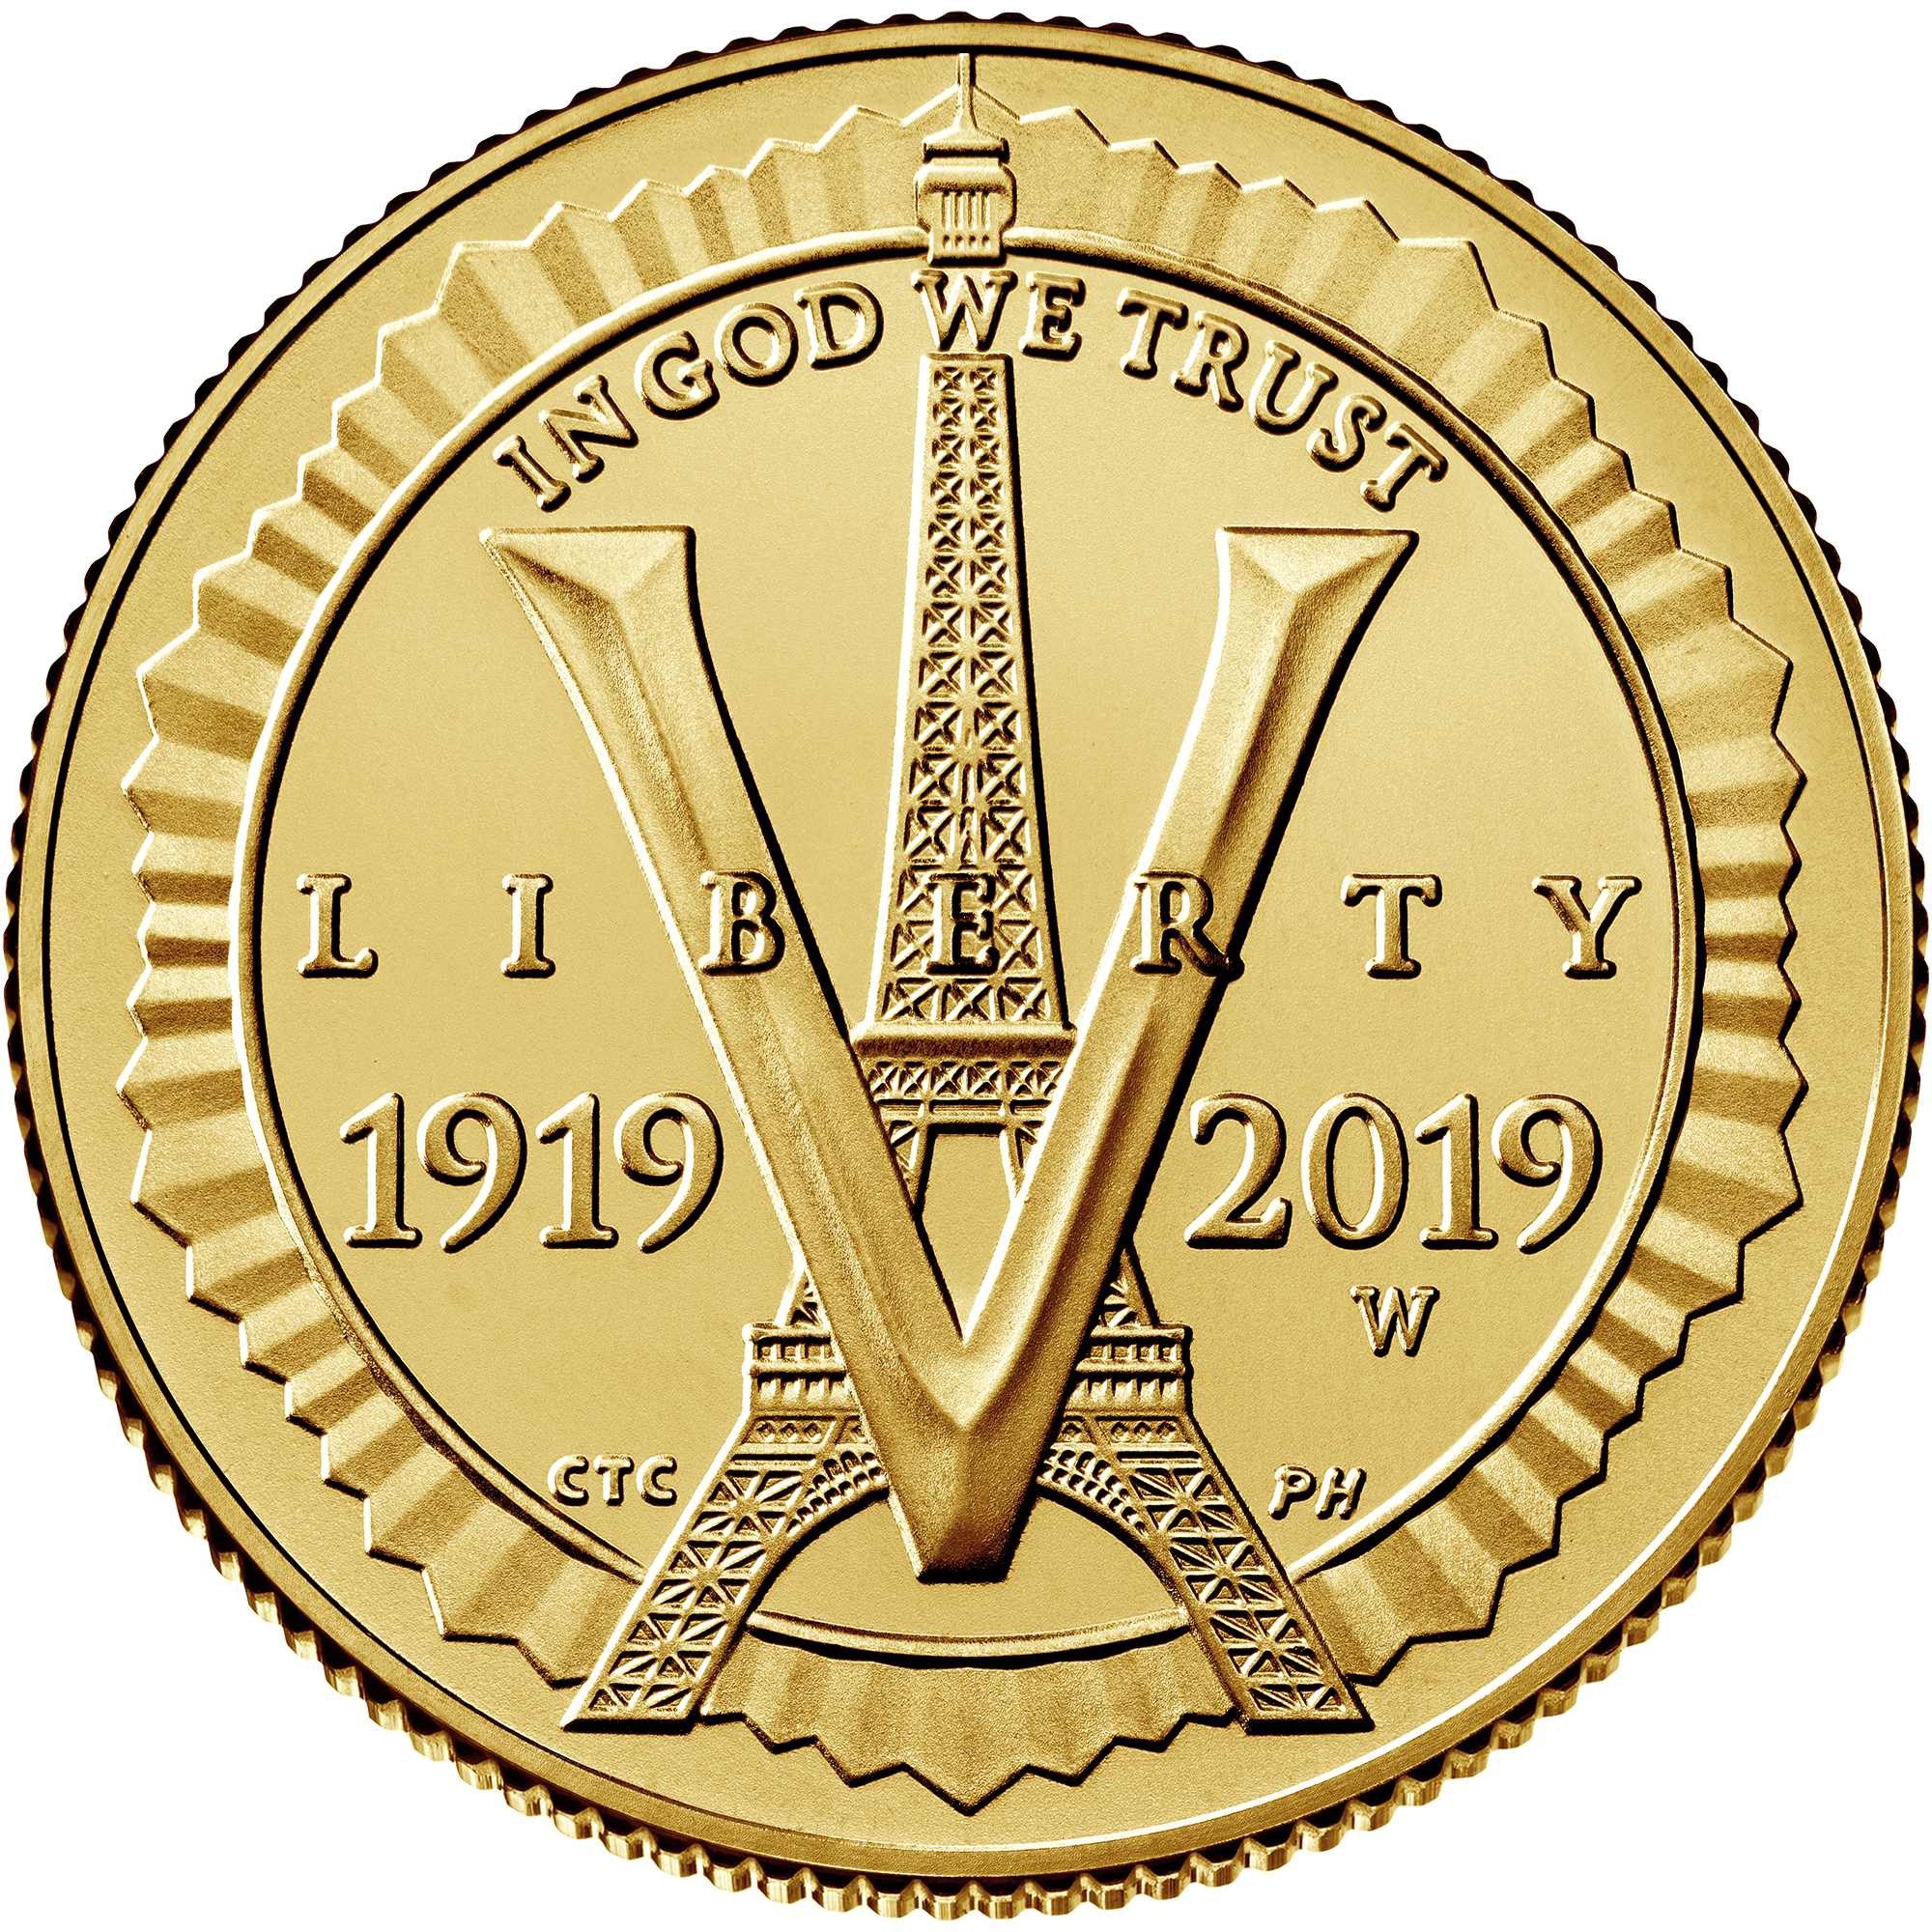 2019 American Legion 100th Anniversary Commemorative Gold Uncirculated Five Dollar Obverse